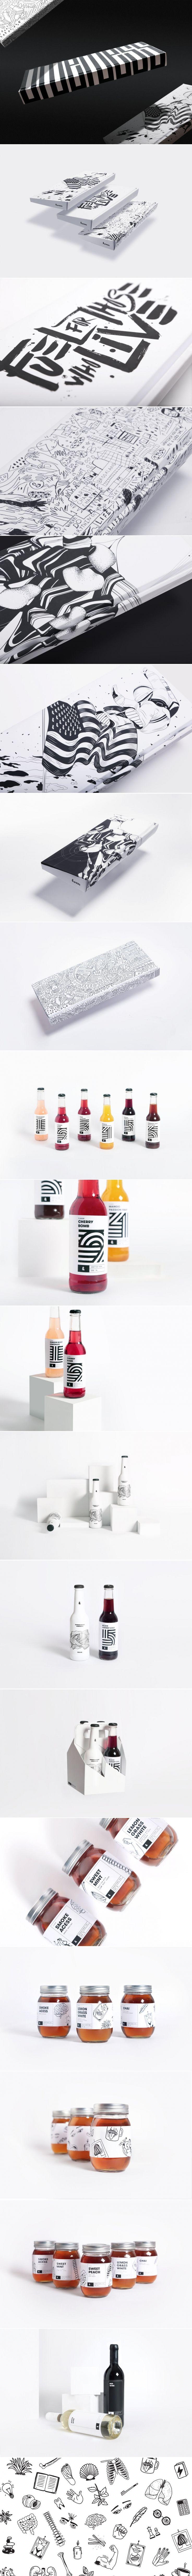 &pizza — The Dieline   Packaging & Branding Design & Innovation News